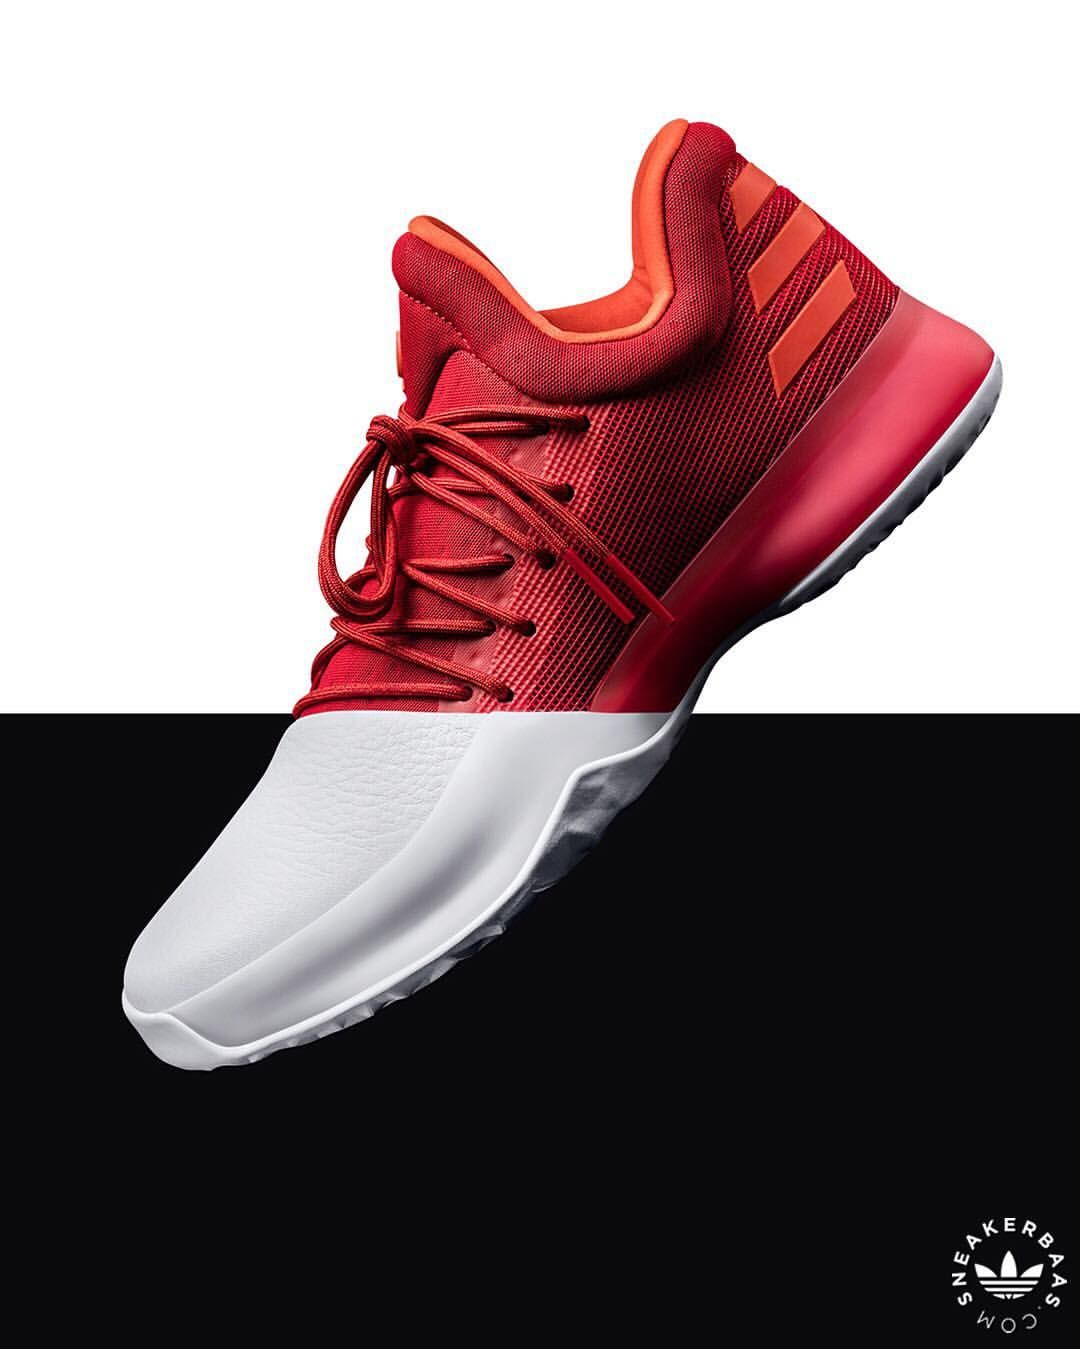 e5d990e0d5e9 Adidas Harden Vol.1 Red   White  sneakers  sneakernews  StreetStyle  Kicks   adidas  nike  vans  newbalance  puma  ADIDAS  ASICS  CONVERSE  DIADORA   REEBOK   ...